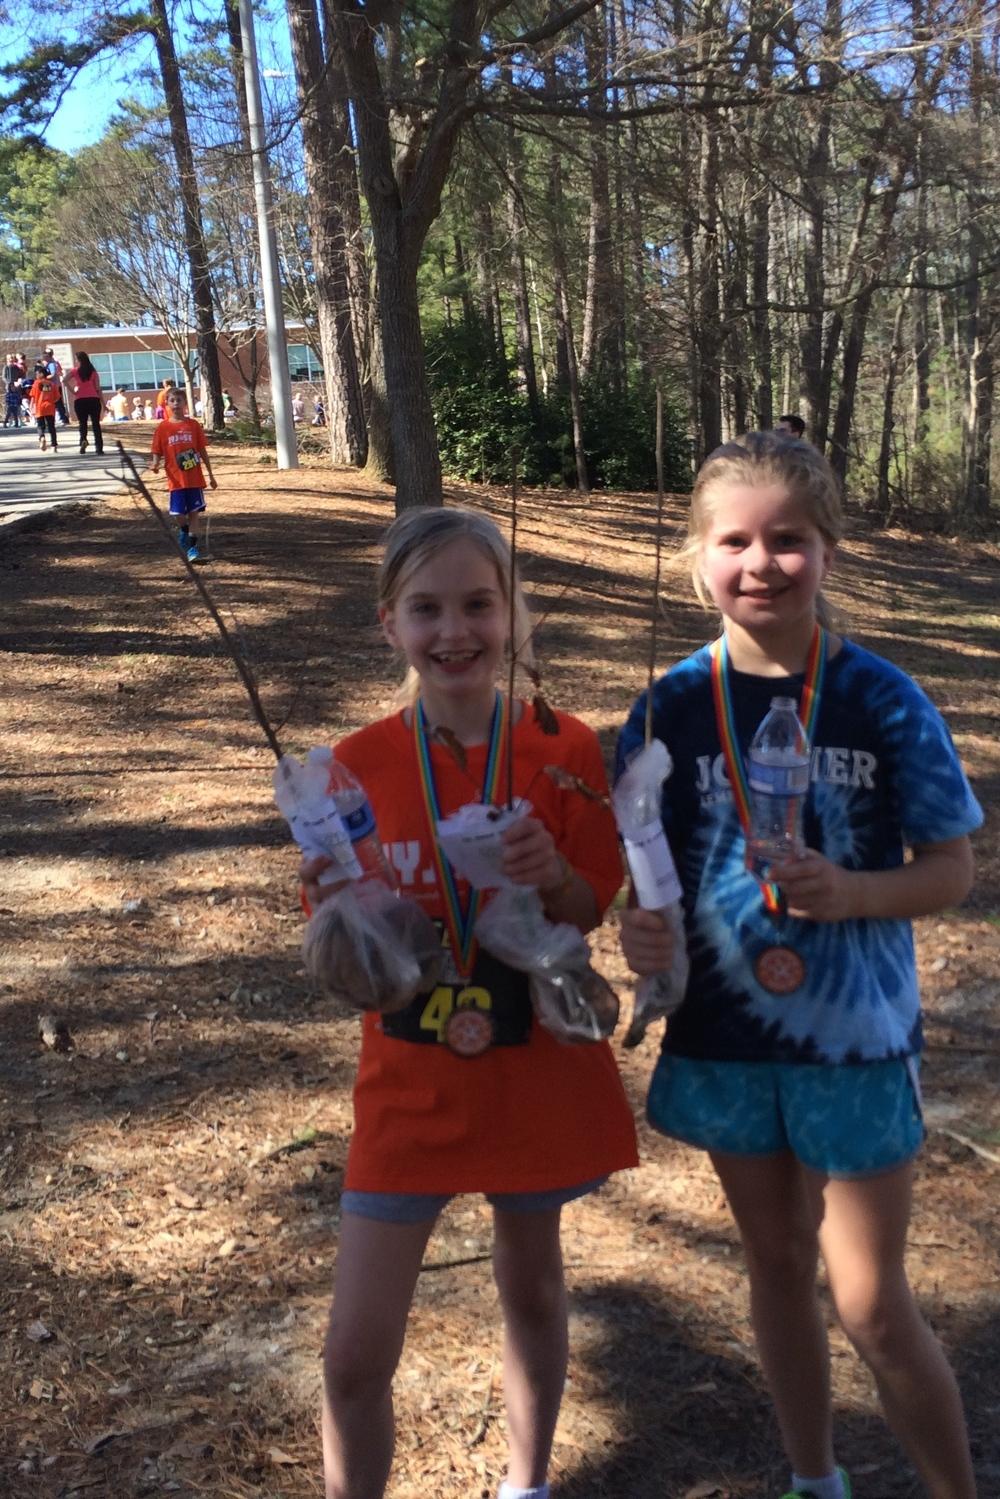 2015 Joyner Elementary 5K Tree Giveaway